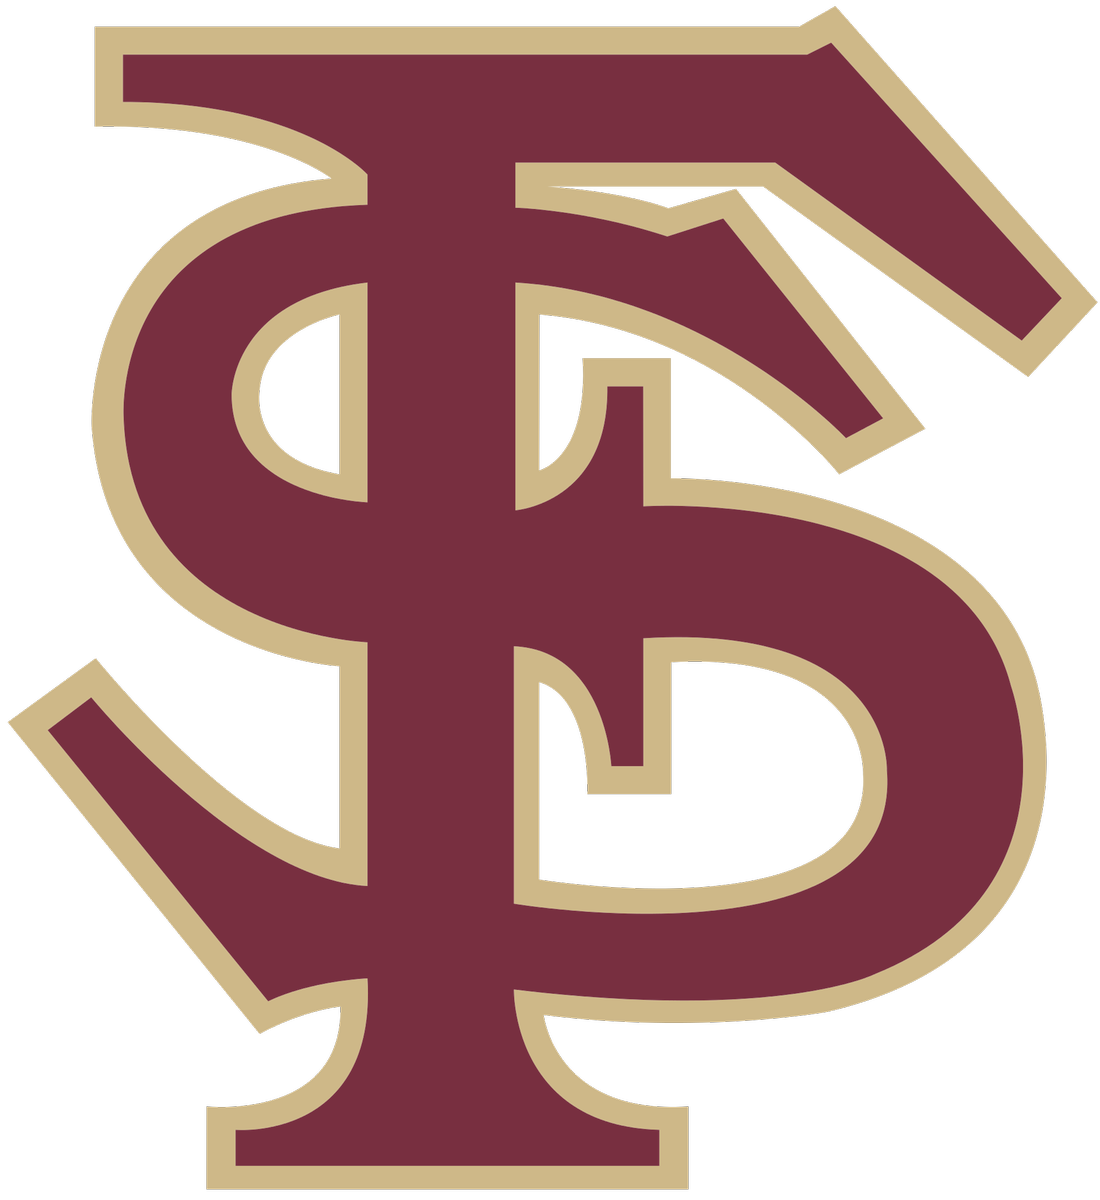 th hill taproom. Florida clipart logo